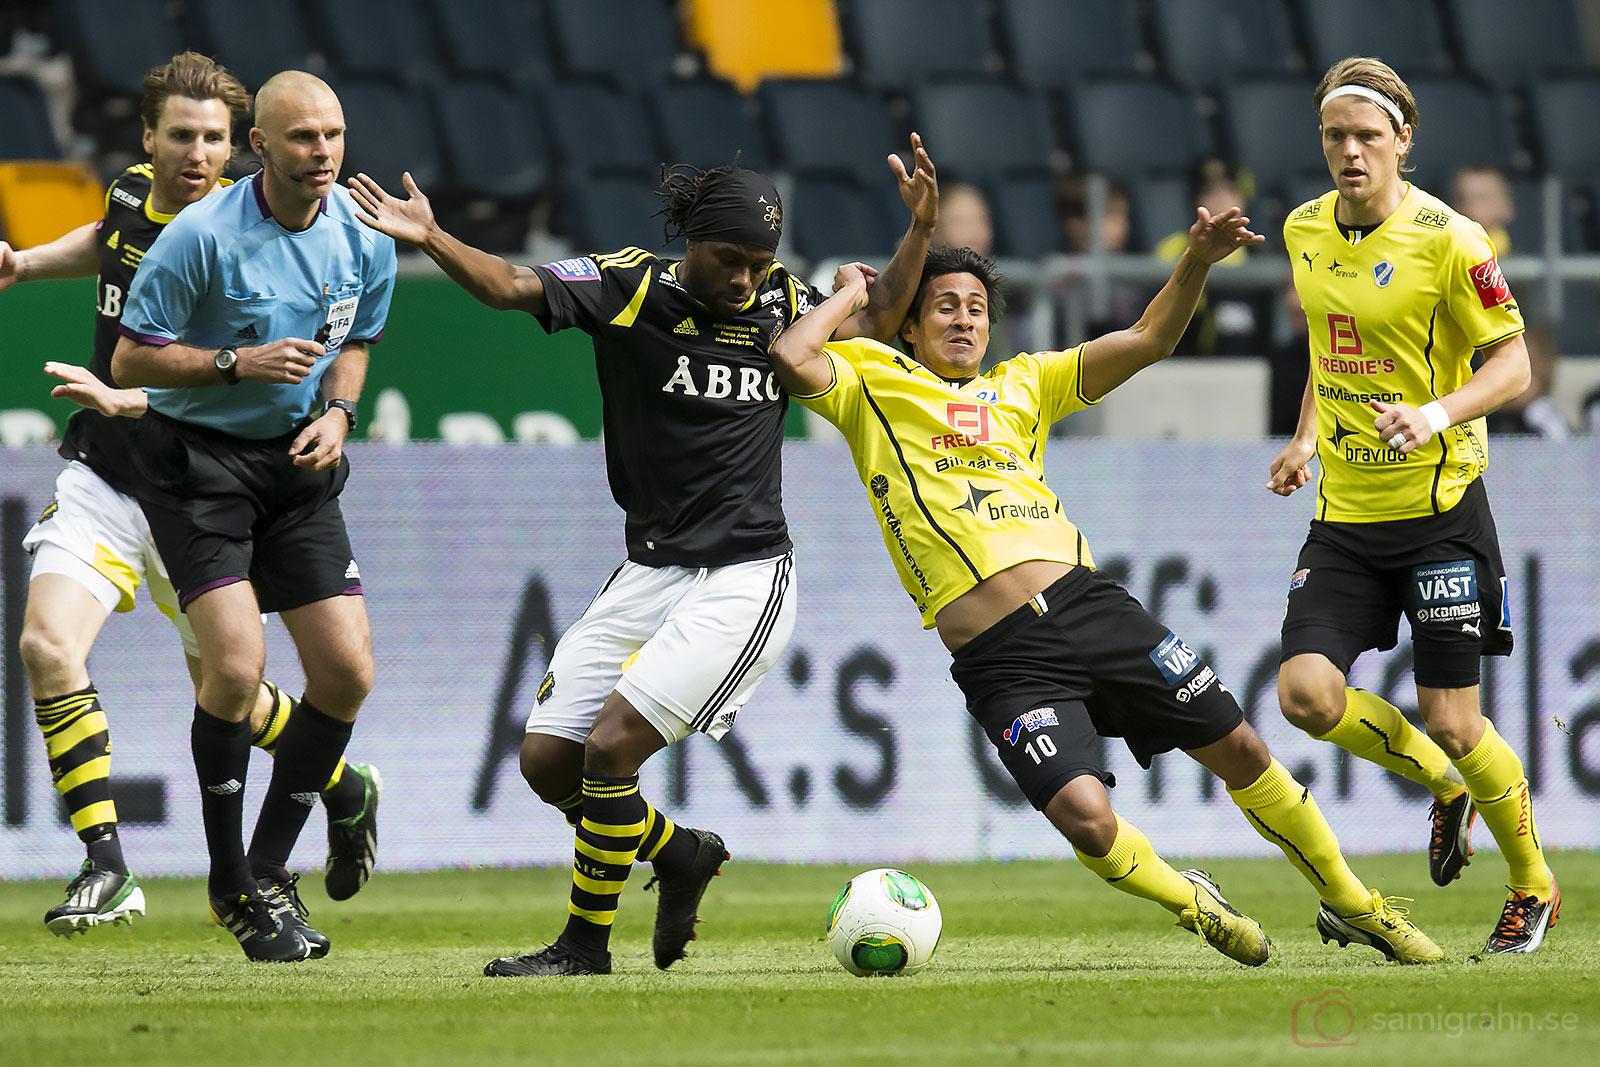 AIK Martin Mutumba och Halmstad Antonio Rojas